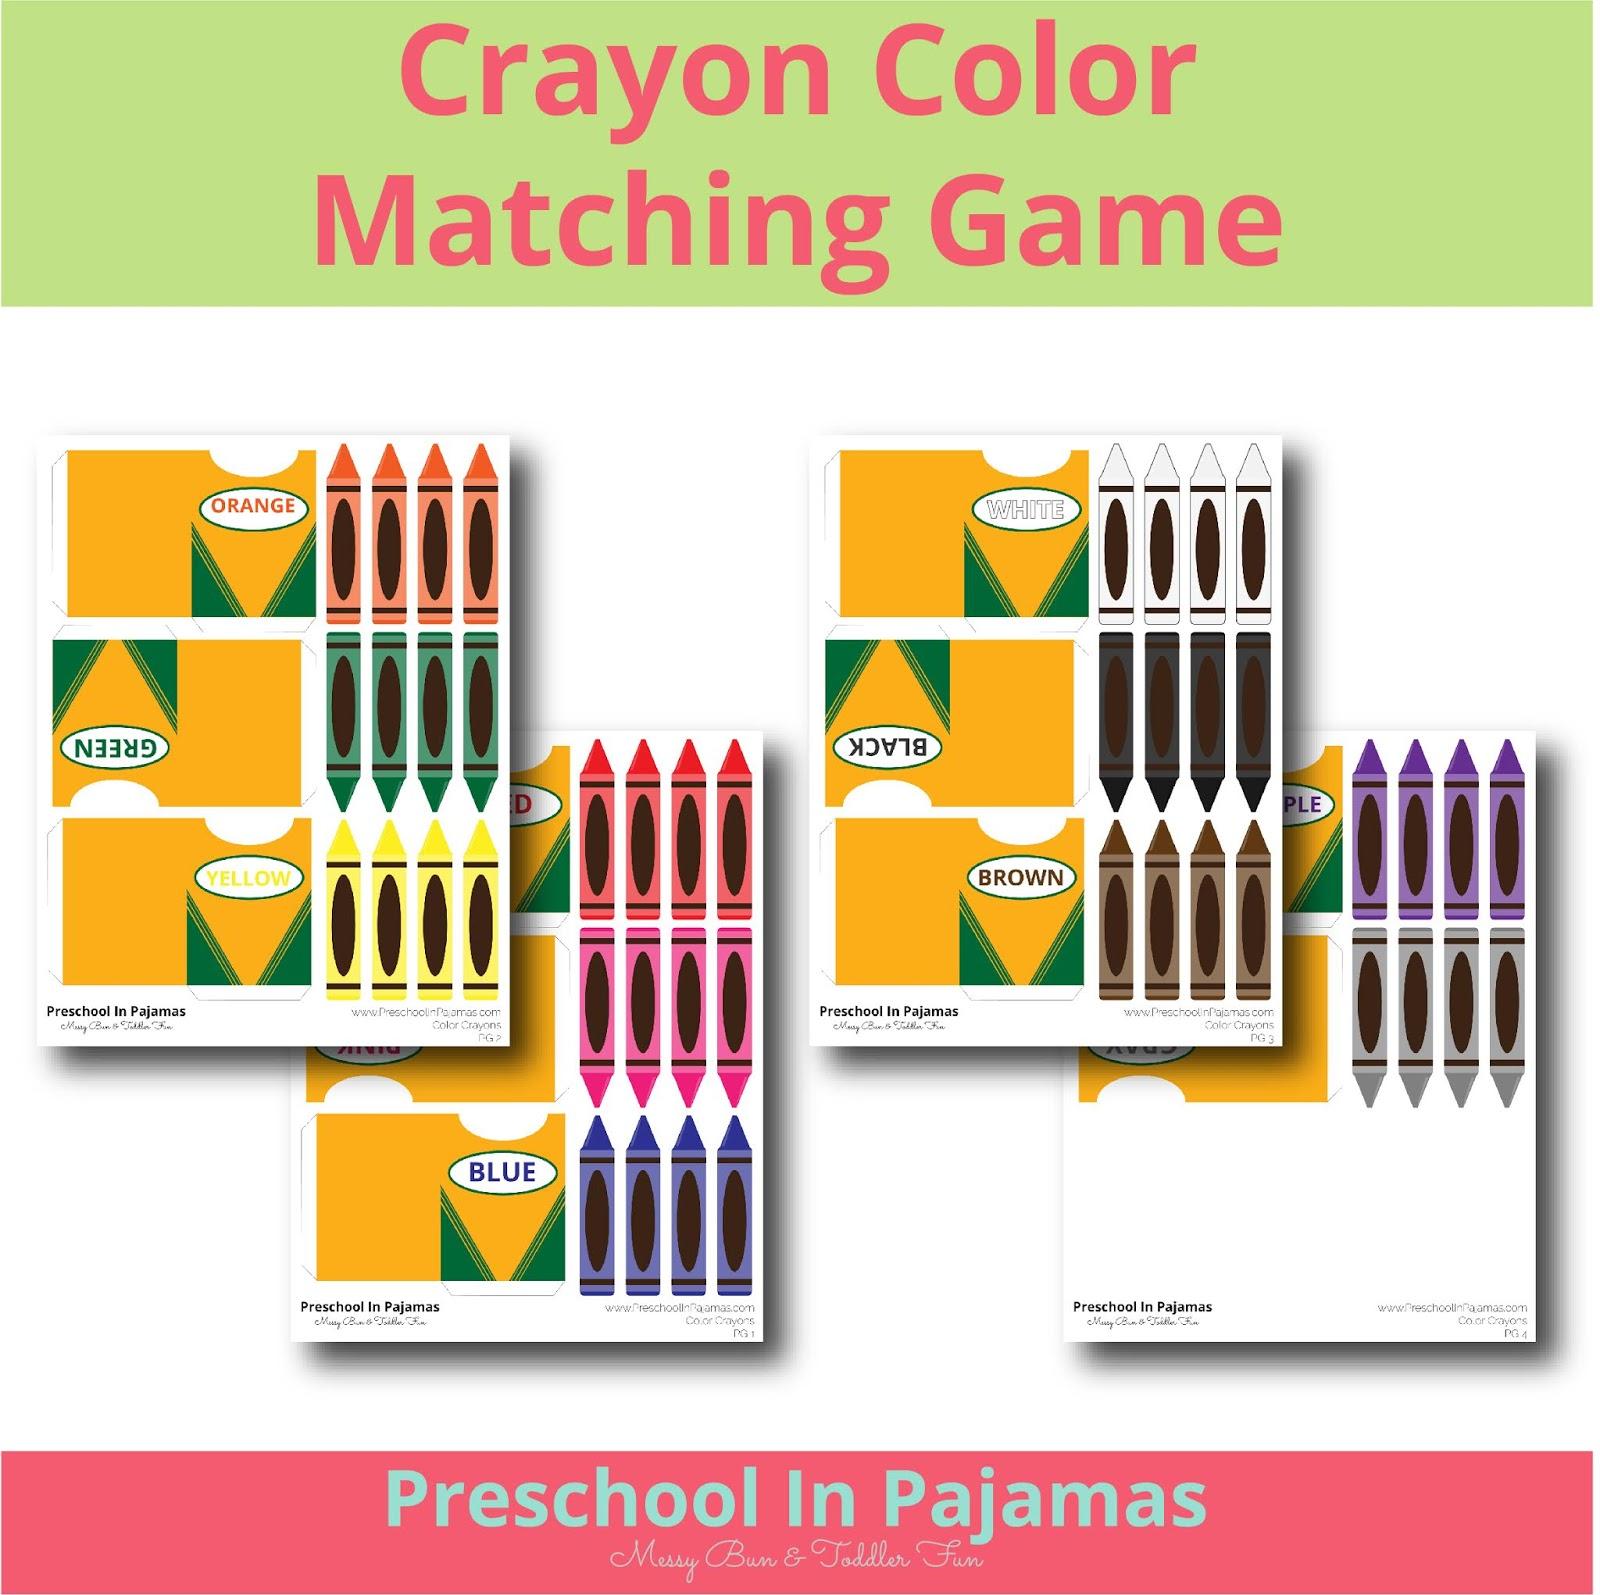 Free Crayon Color Matching Game Printable